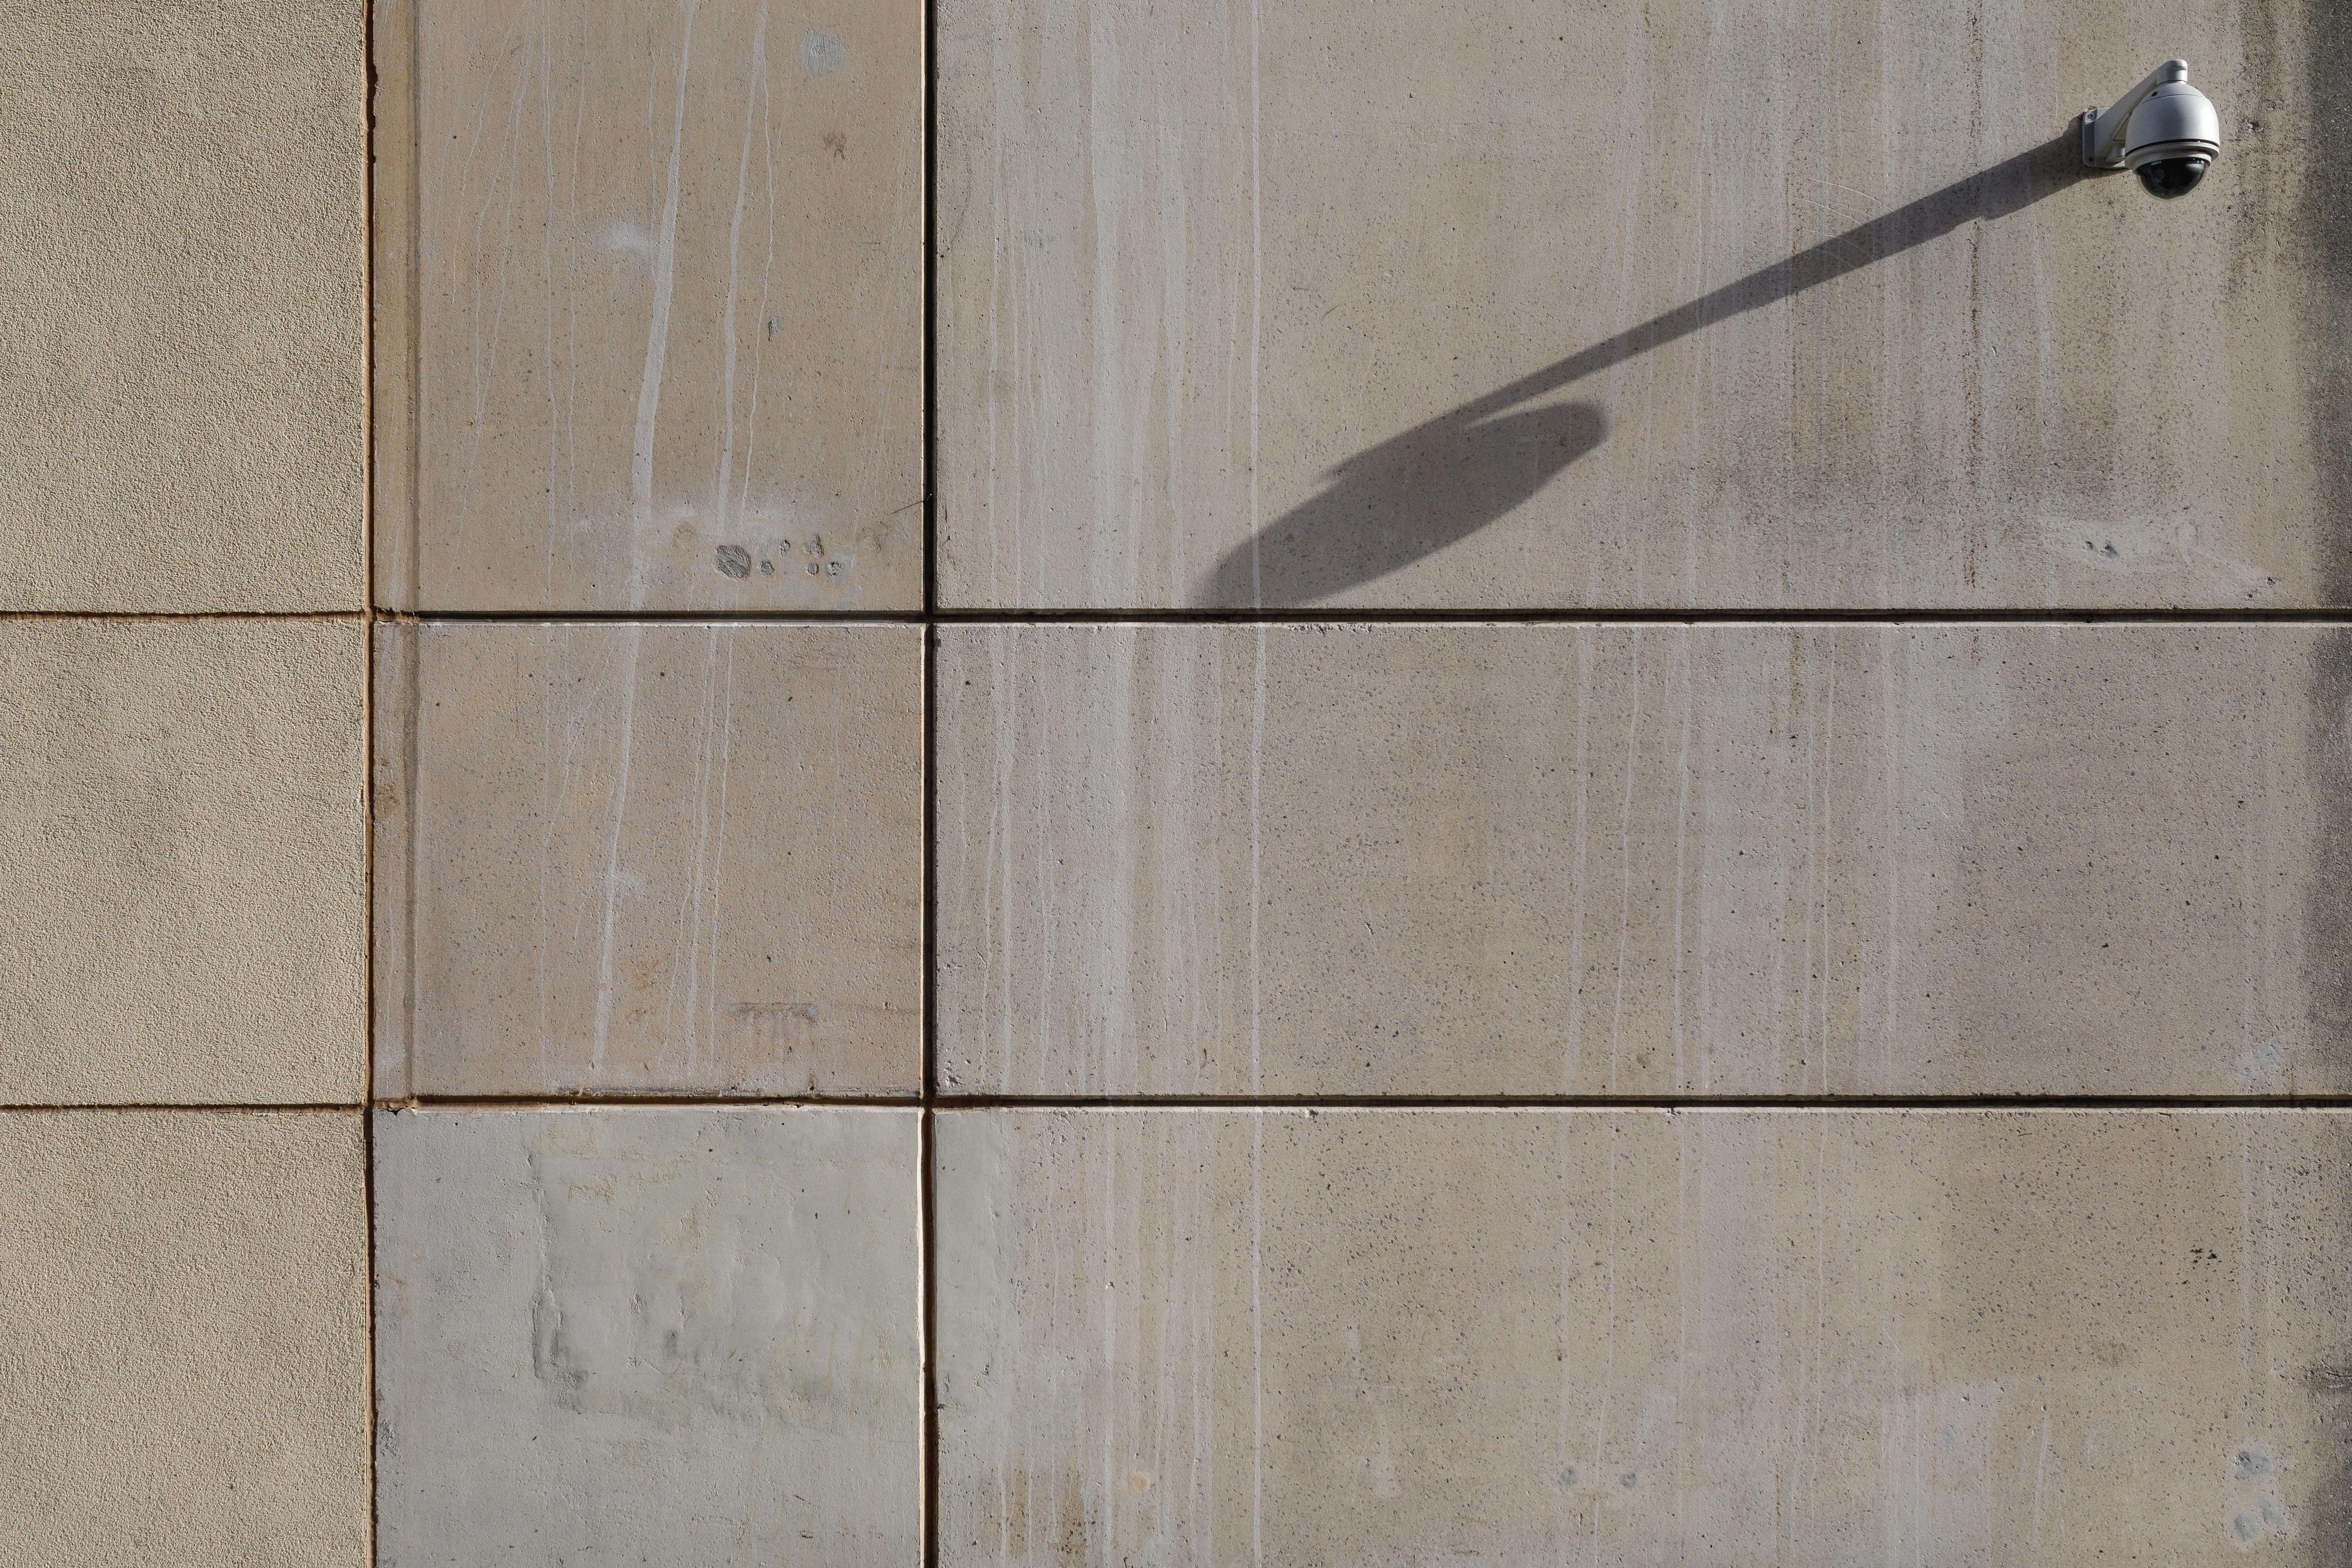 photo of white wall-mounted light